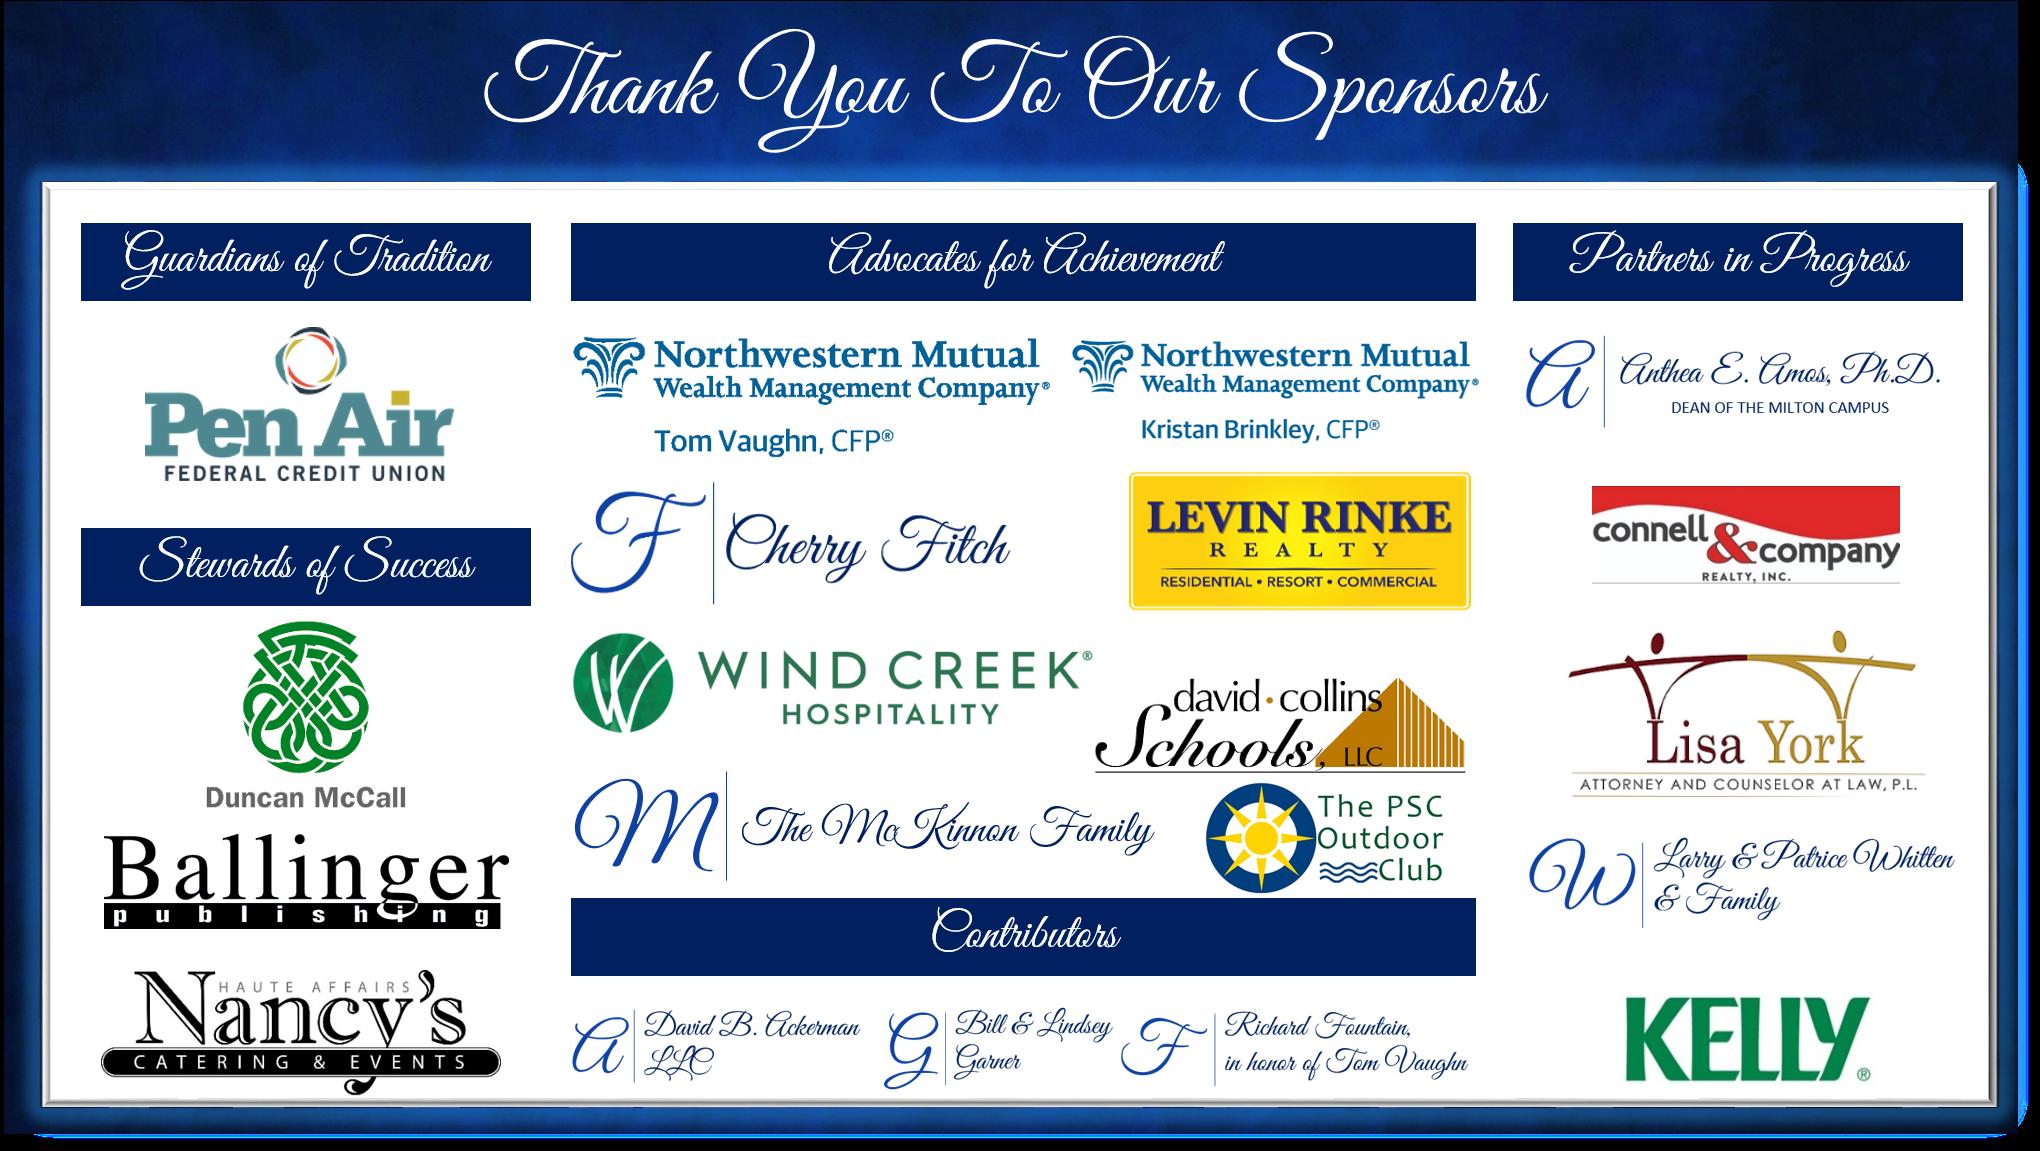 decorative image of sponsor-thank-you-final , The 2019 Distinguished Alumni Awards 2019-05-06 10:34:06